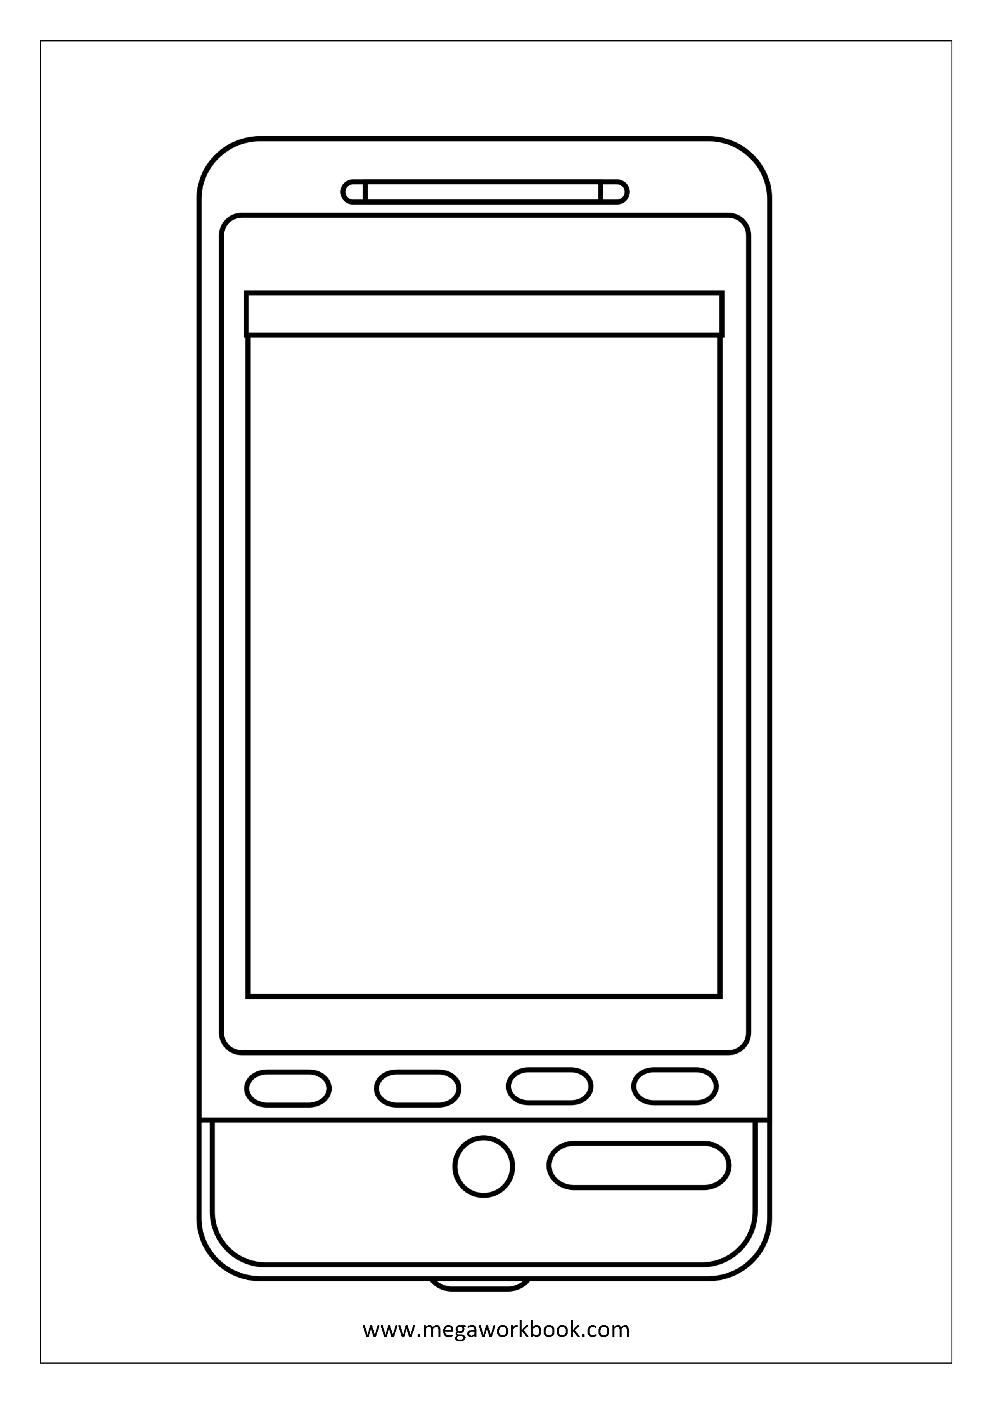 cell phone coloring pages cell phone coloring page coloring home coloring pages cell phone